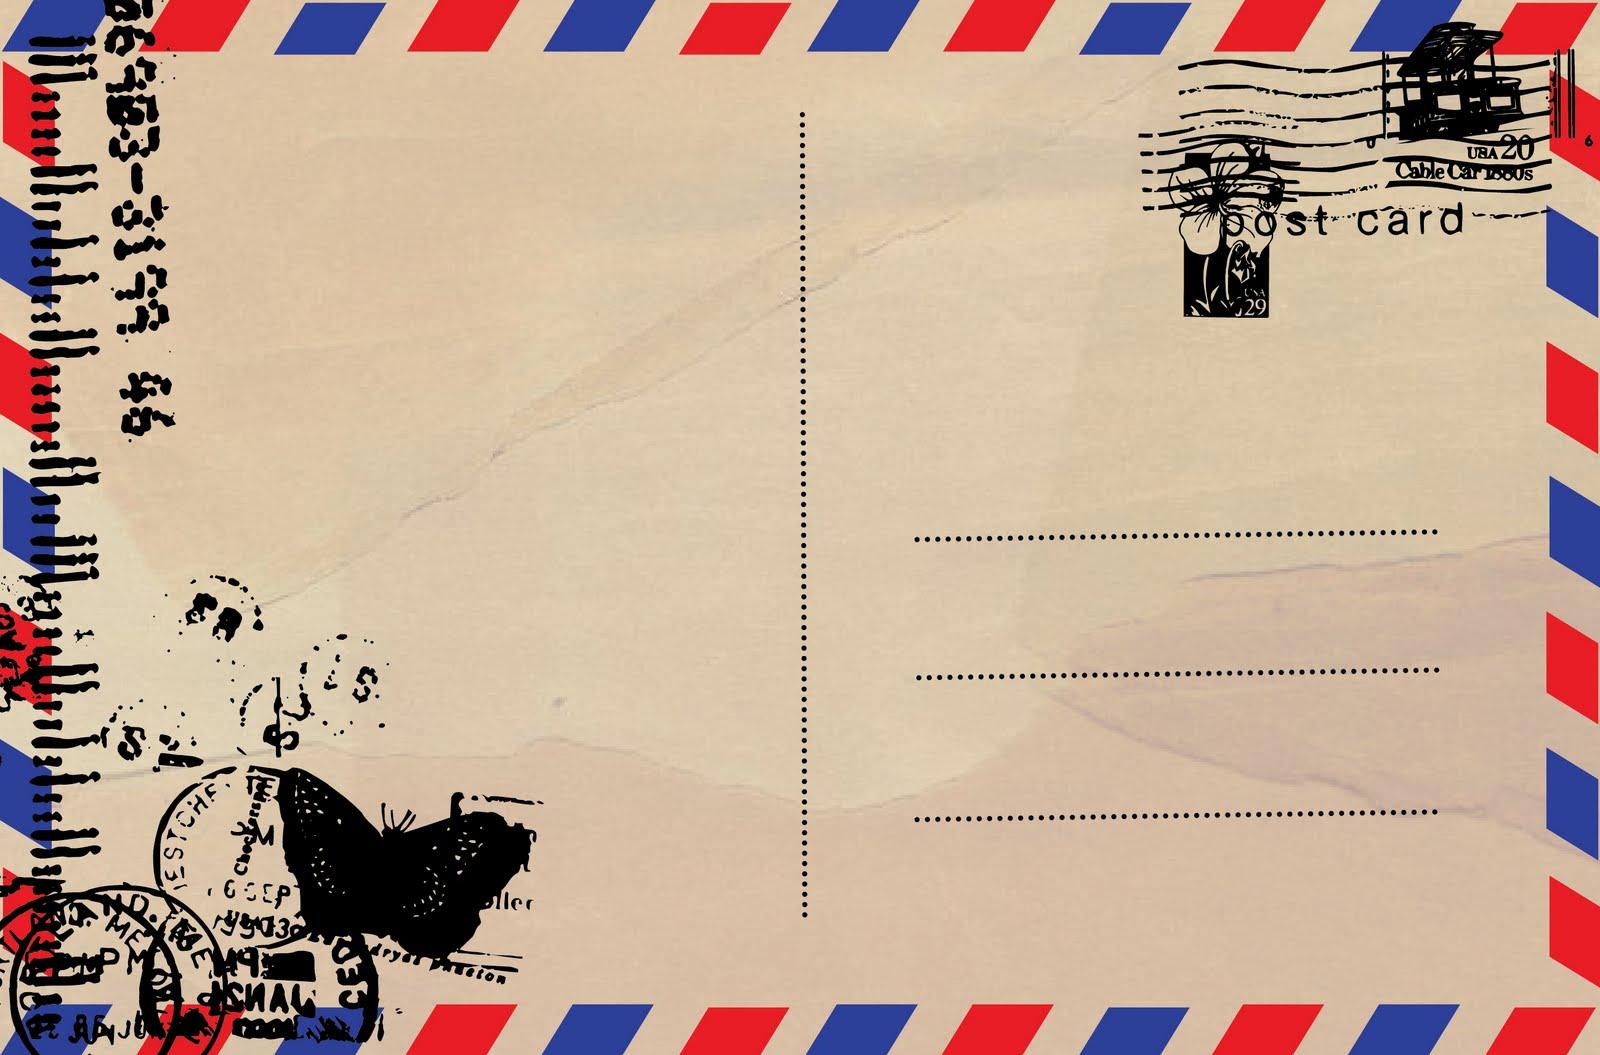 Ms Word Postcard Template burris blank double post card template – Free Microsoft Word Postcard Template